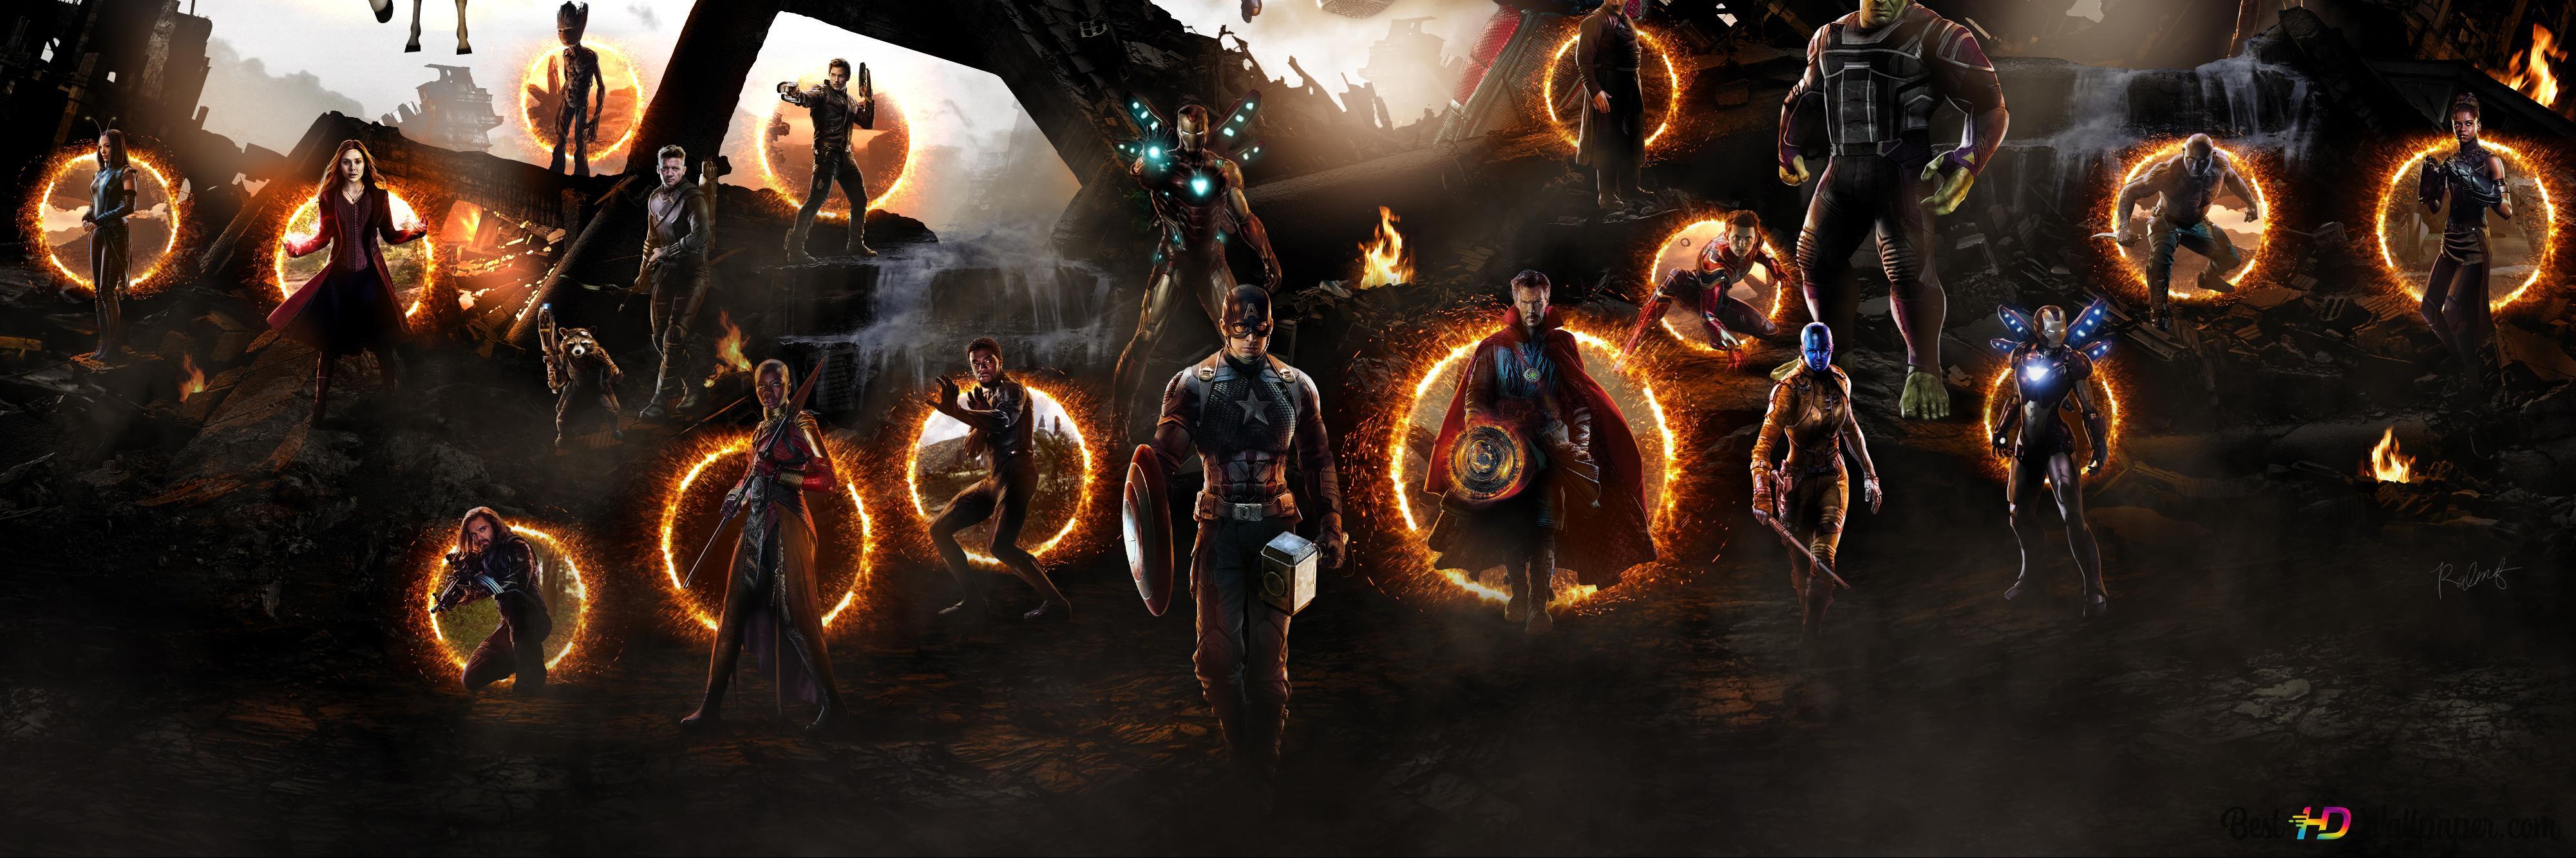 Download Avengers Endgame Final Battle Wallpaper Cikimm Com